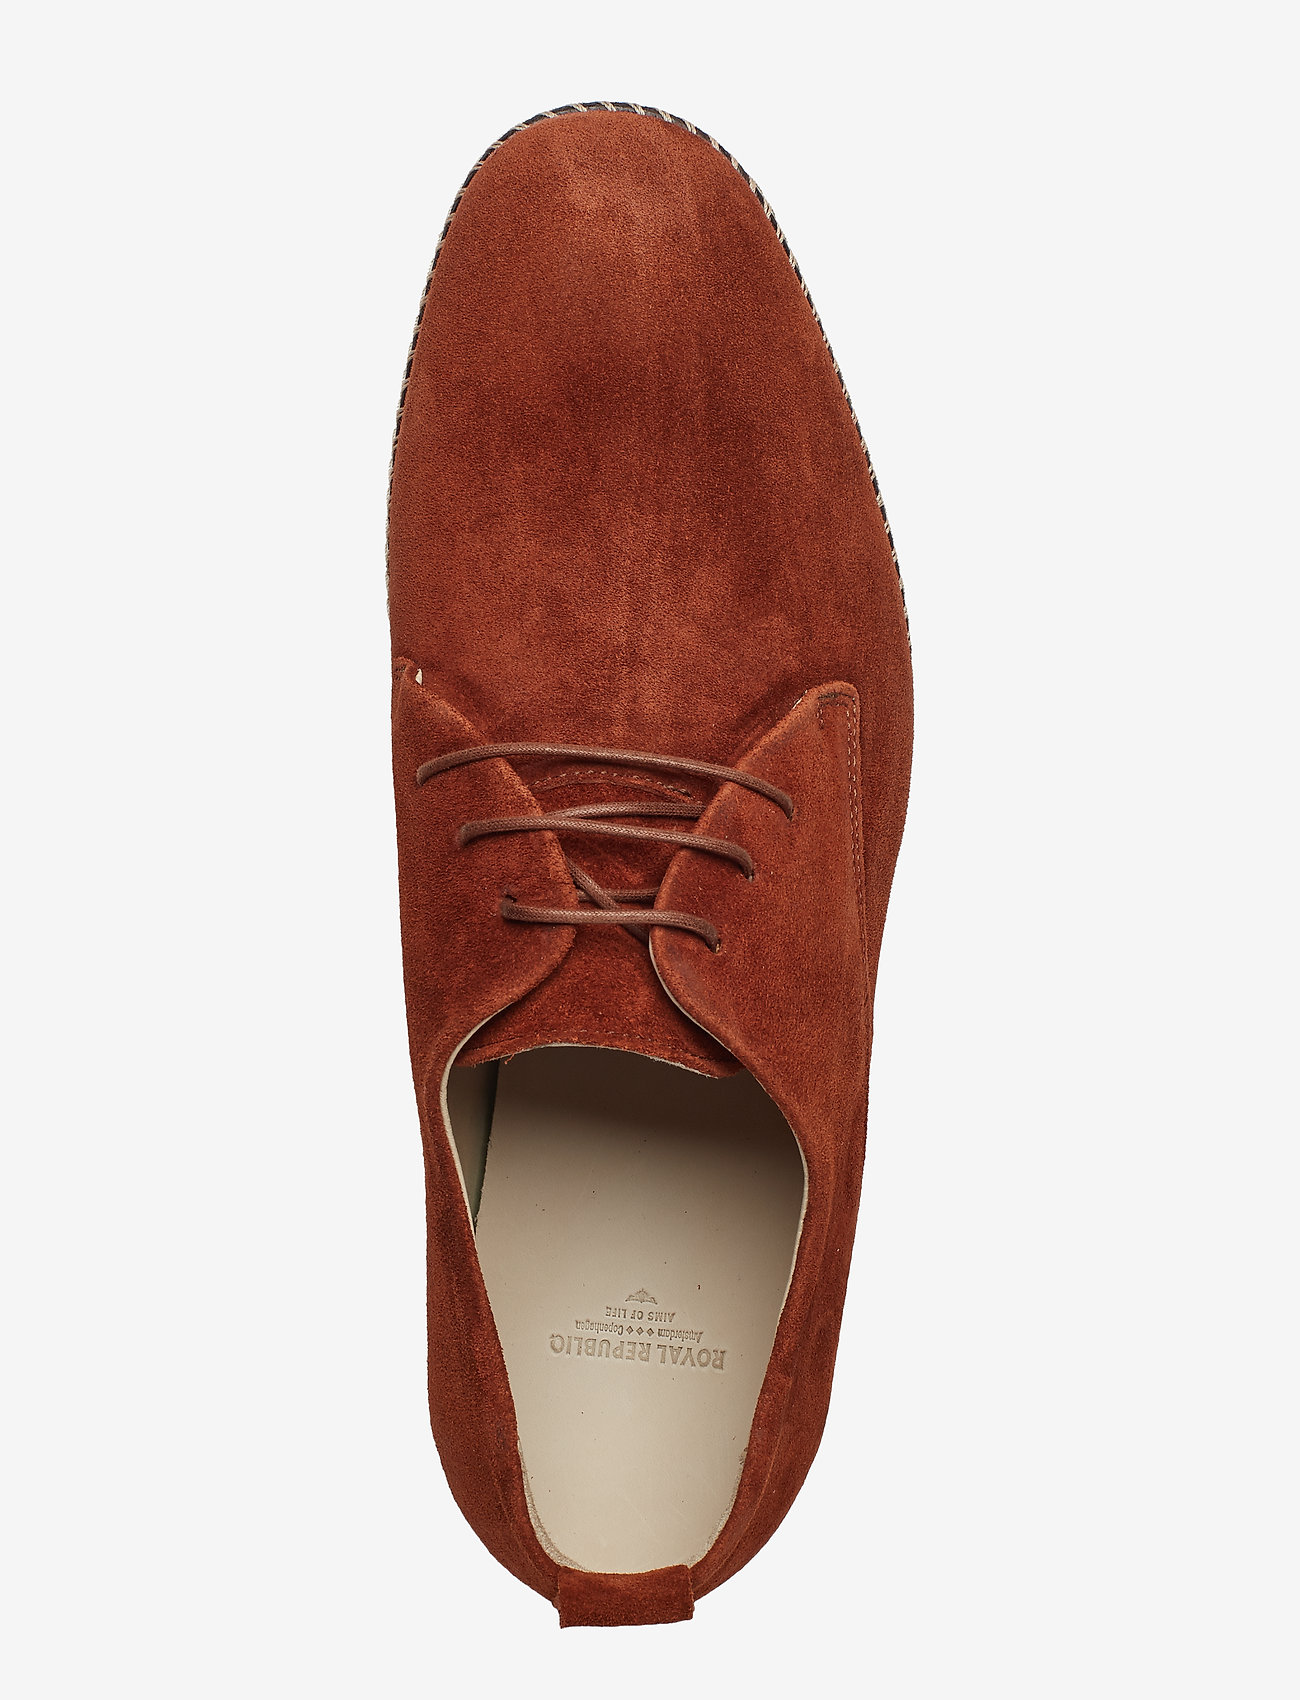 Royal RepubliQ Evo Derby Shoe Suede - Business TAN - Schuhe Billige